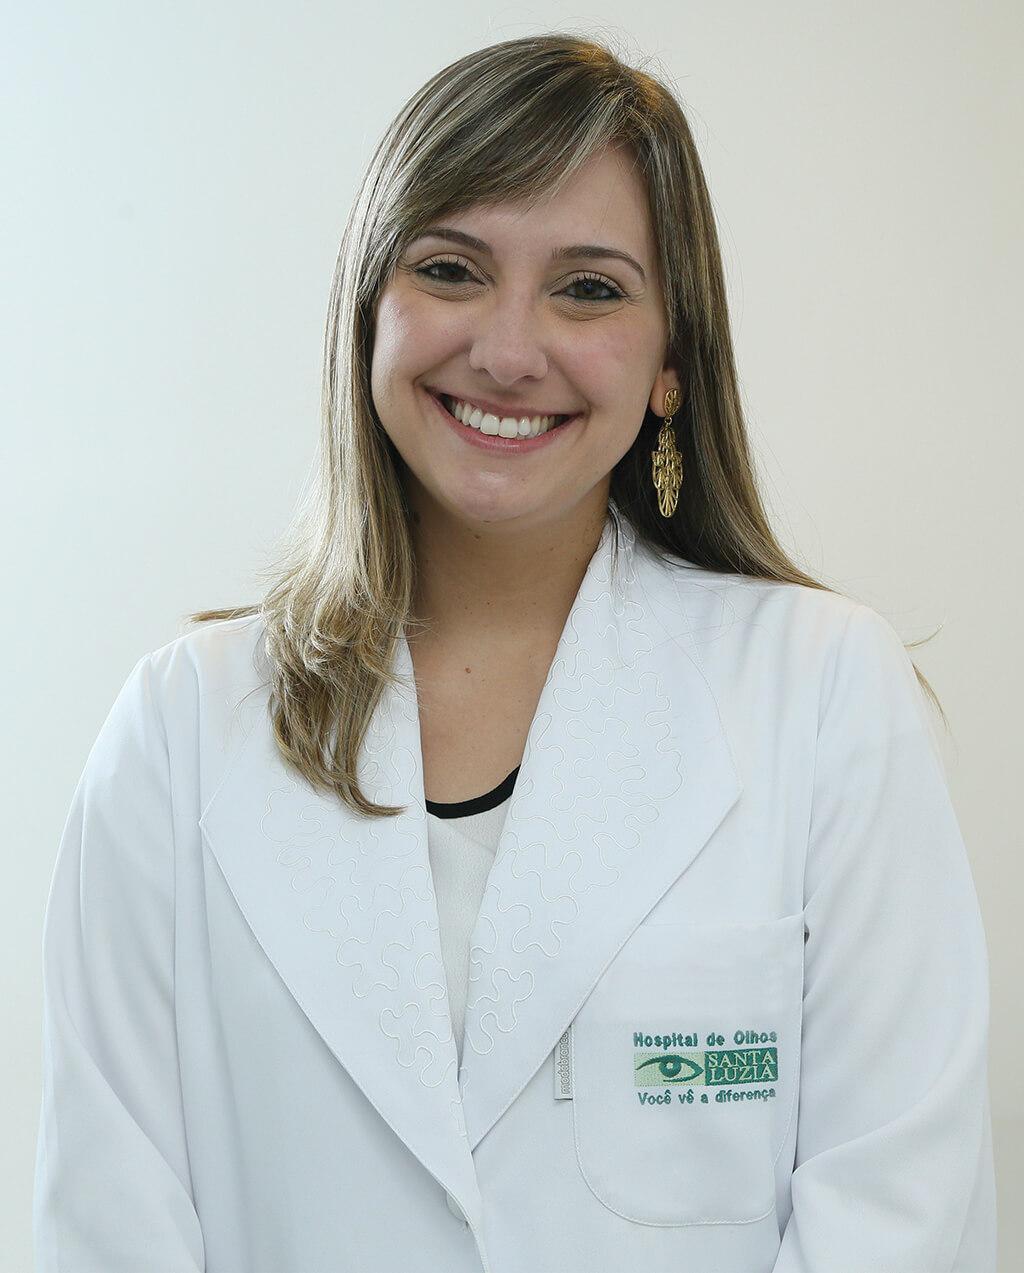 Marcela Ferraz Costa